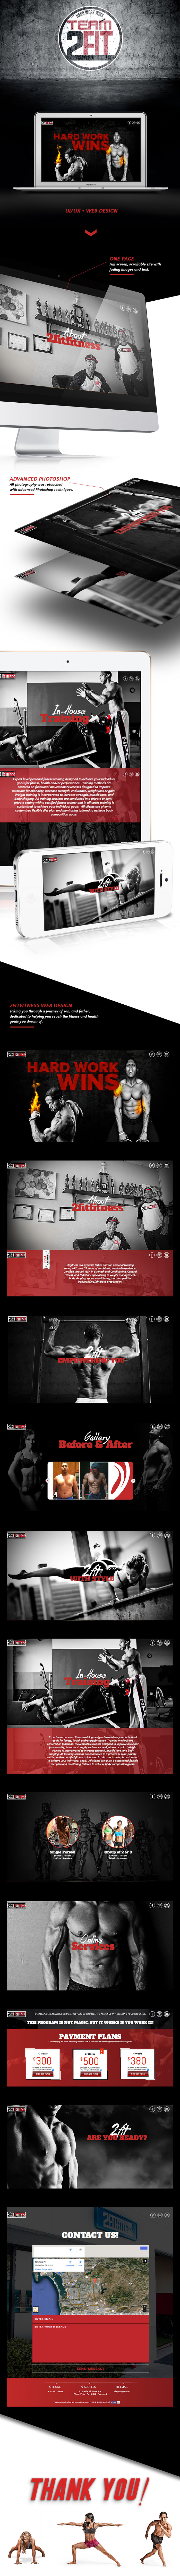 2fitfitness_Webdesign_Mockup